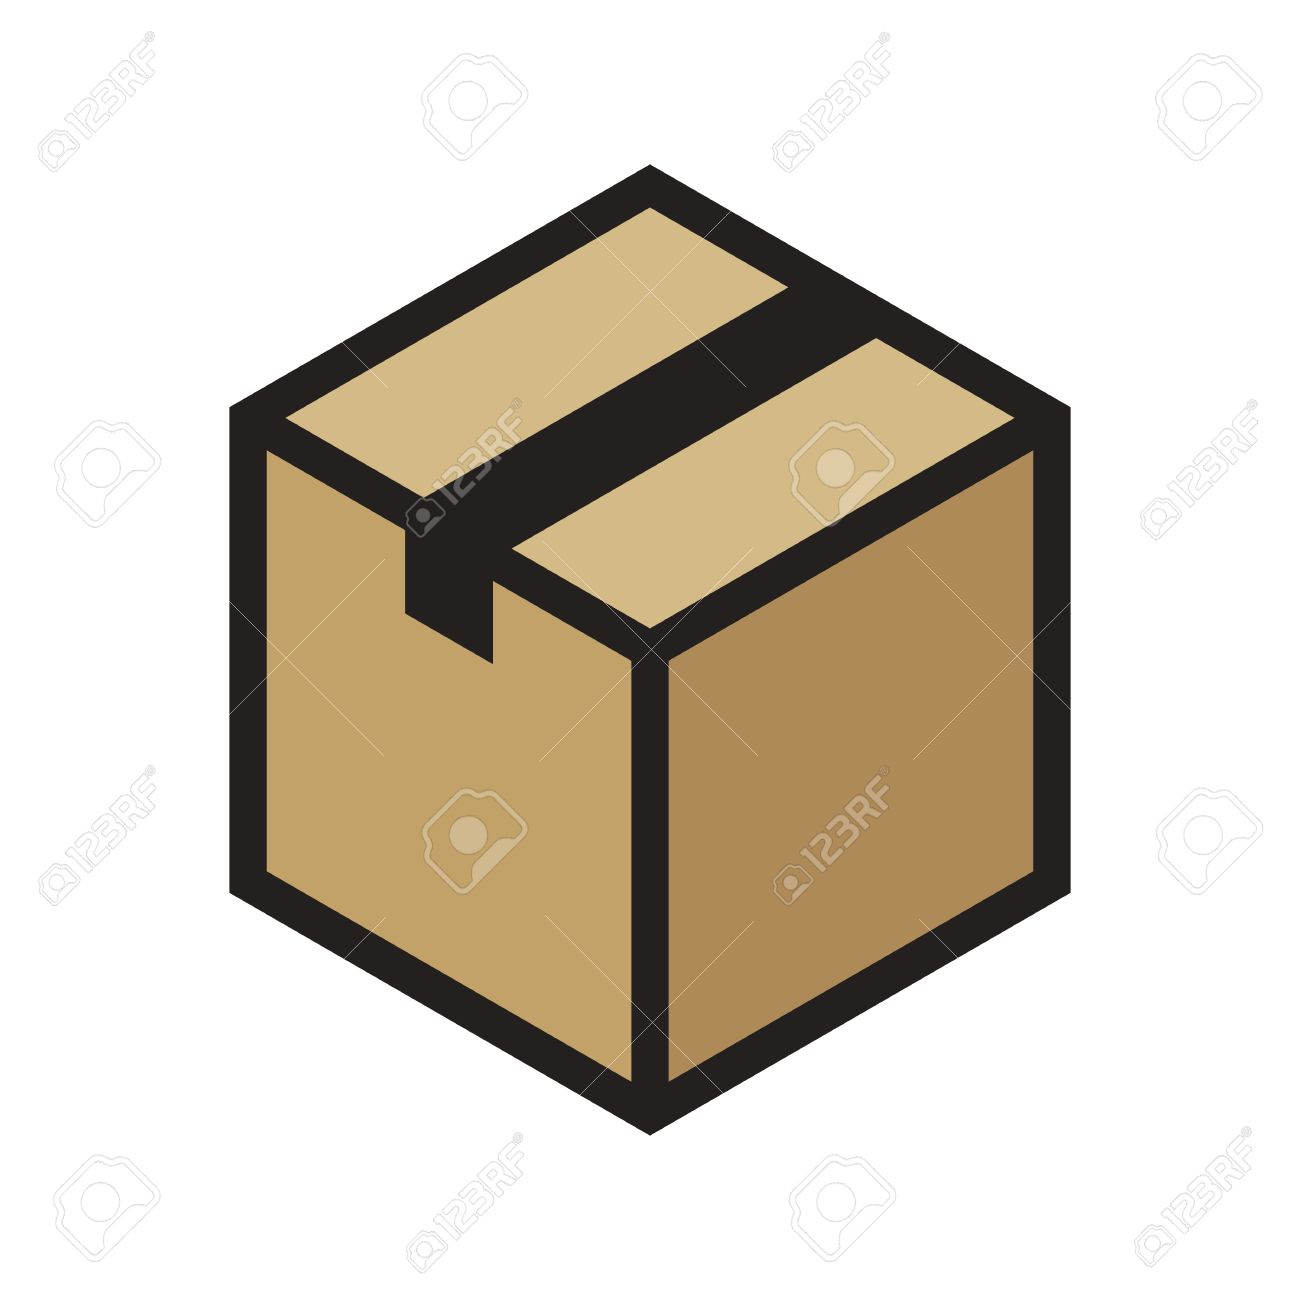 isometric cardboard box outline colored icon modern minimal rh 123rf com box vector icon box vector bmx cranks